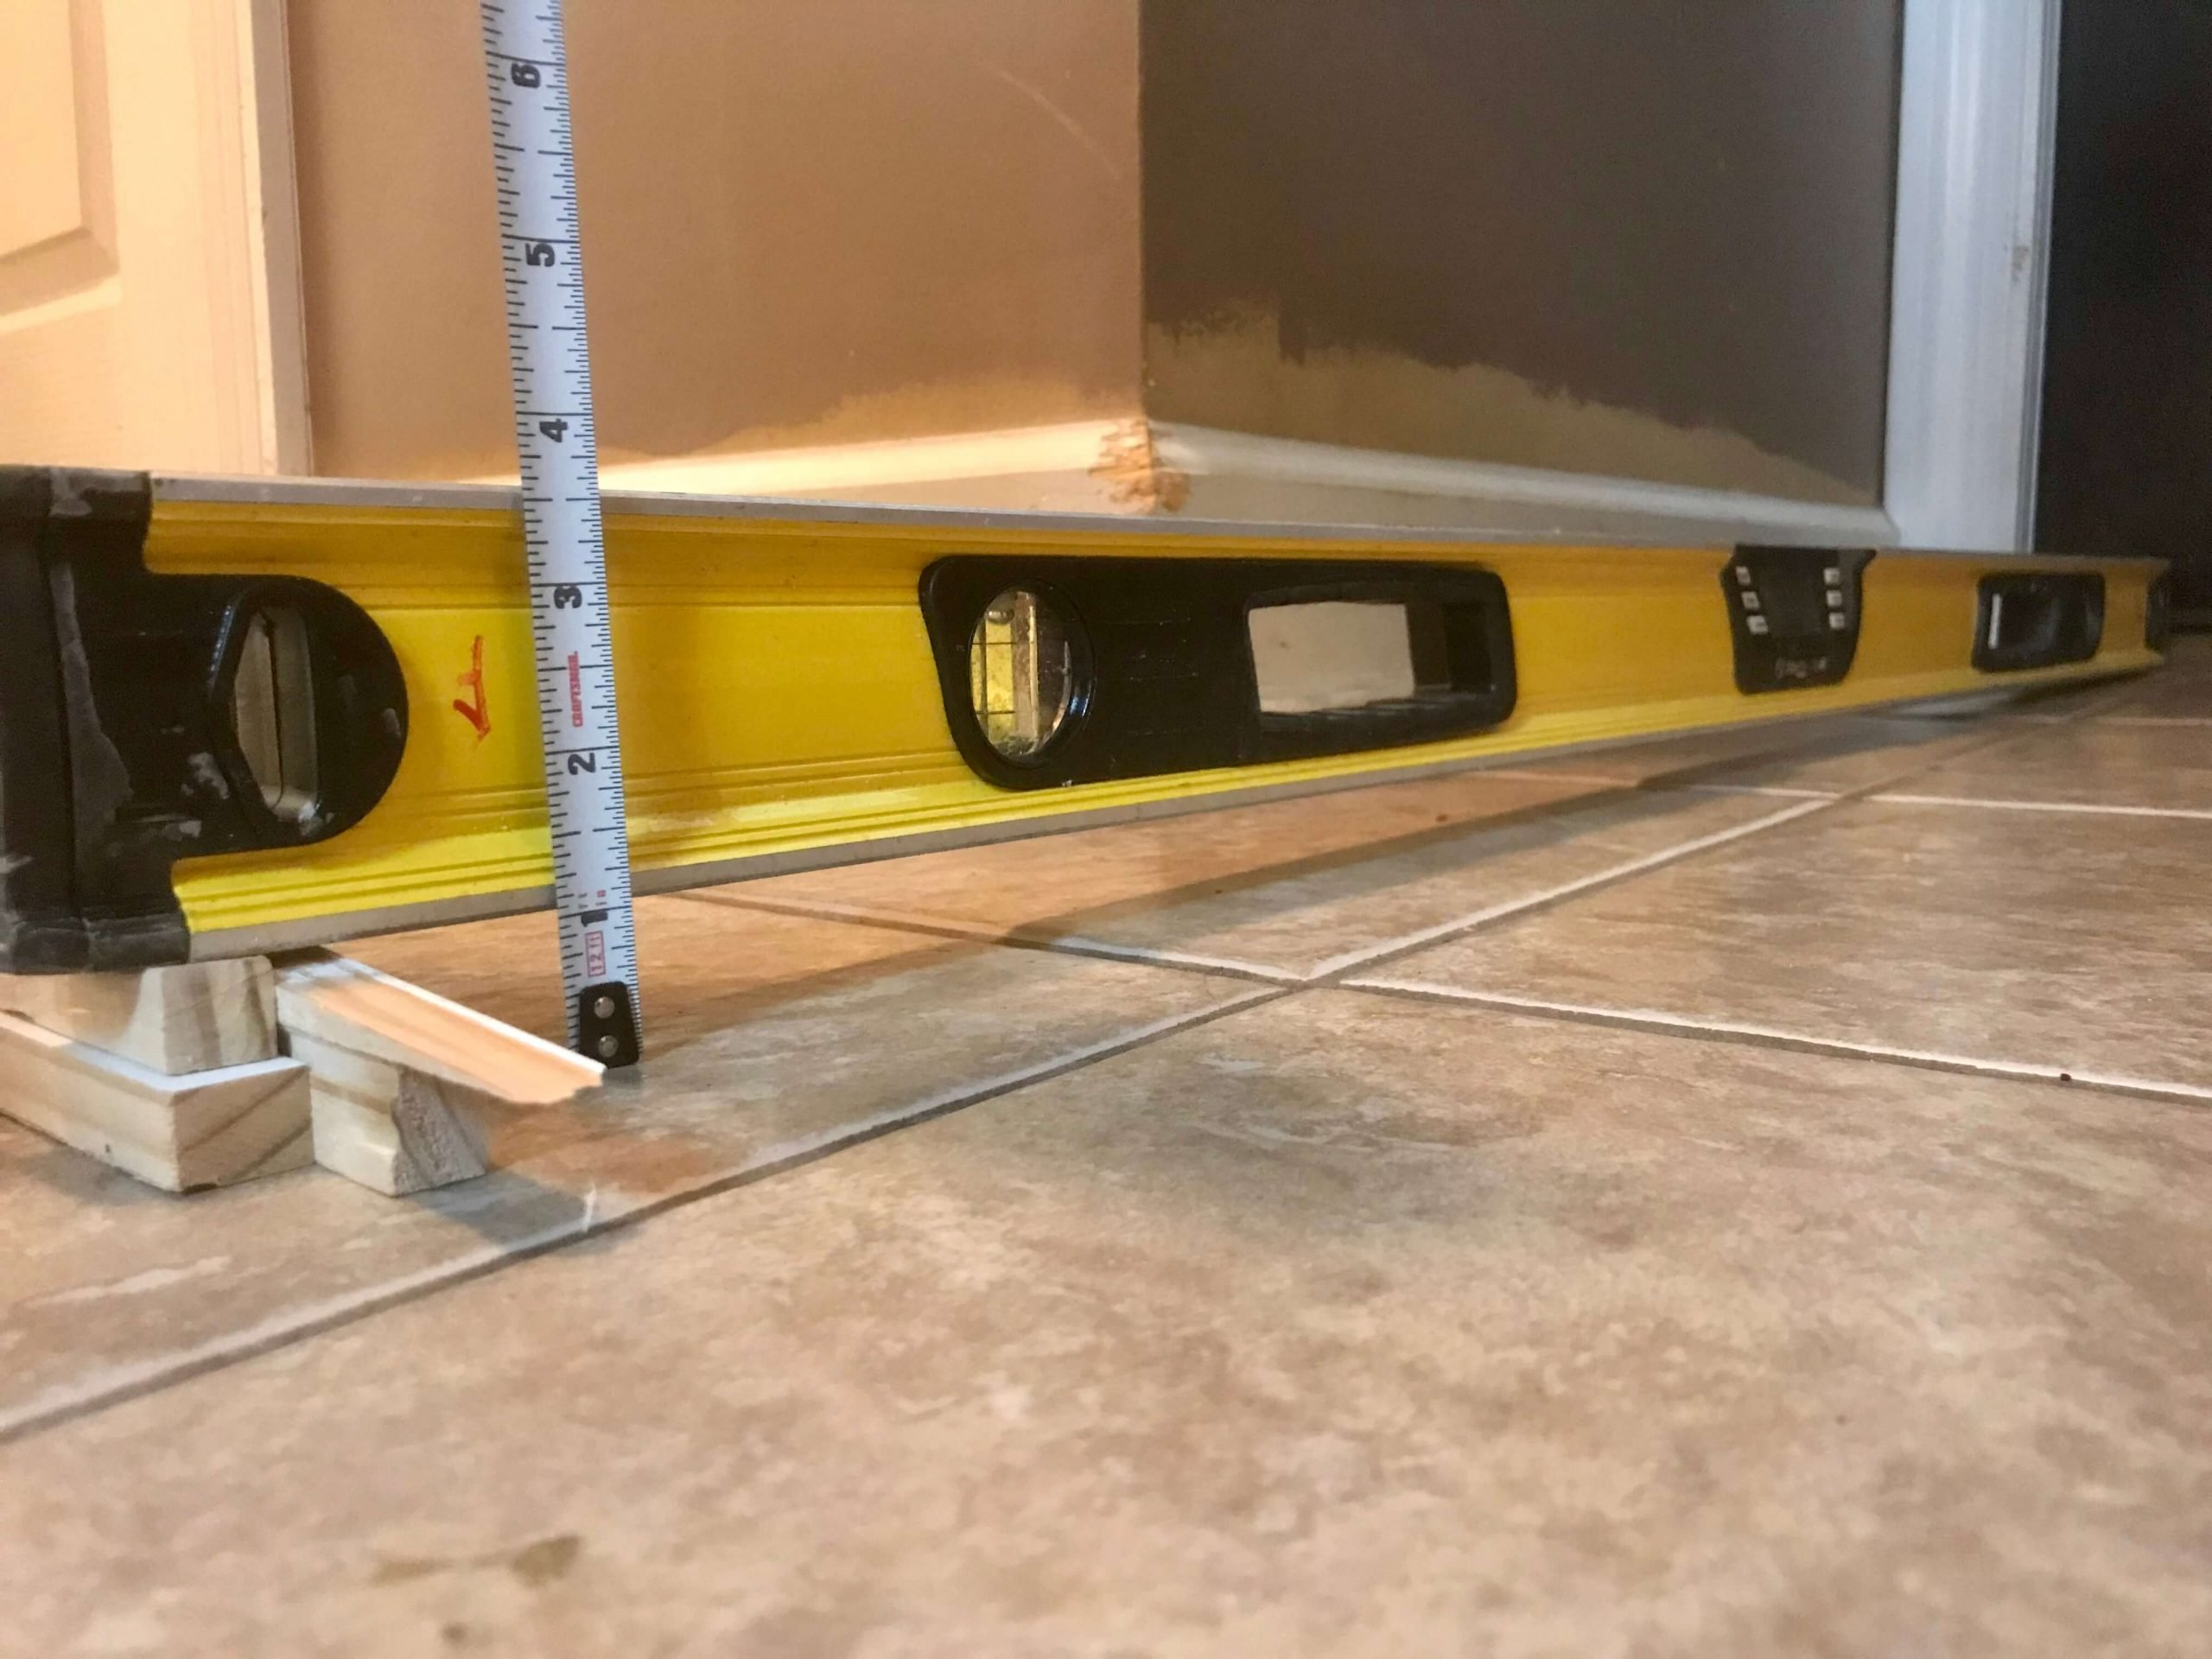 Un-level Floors